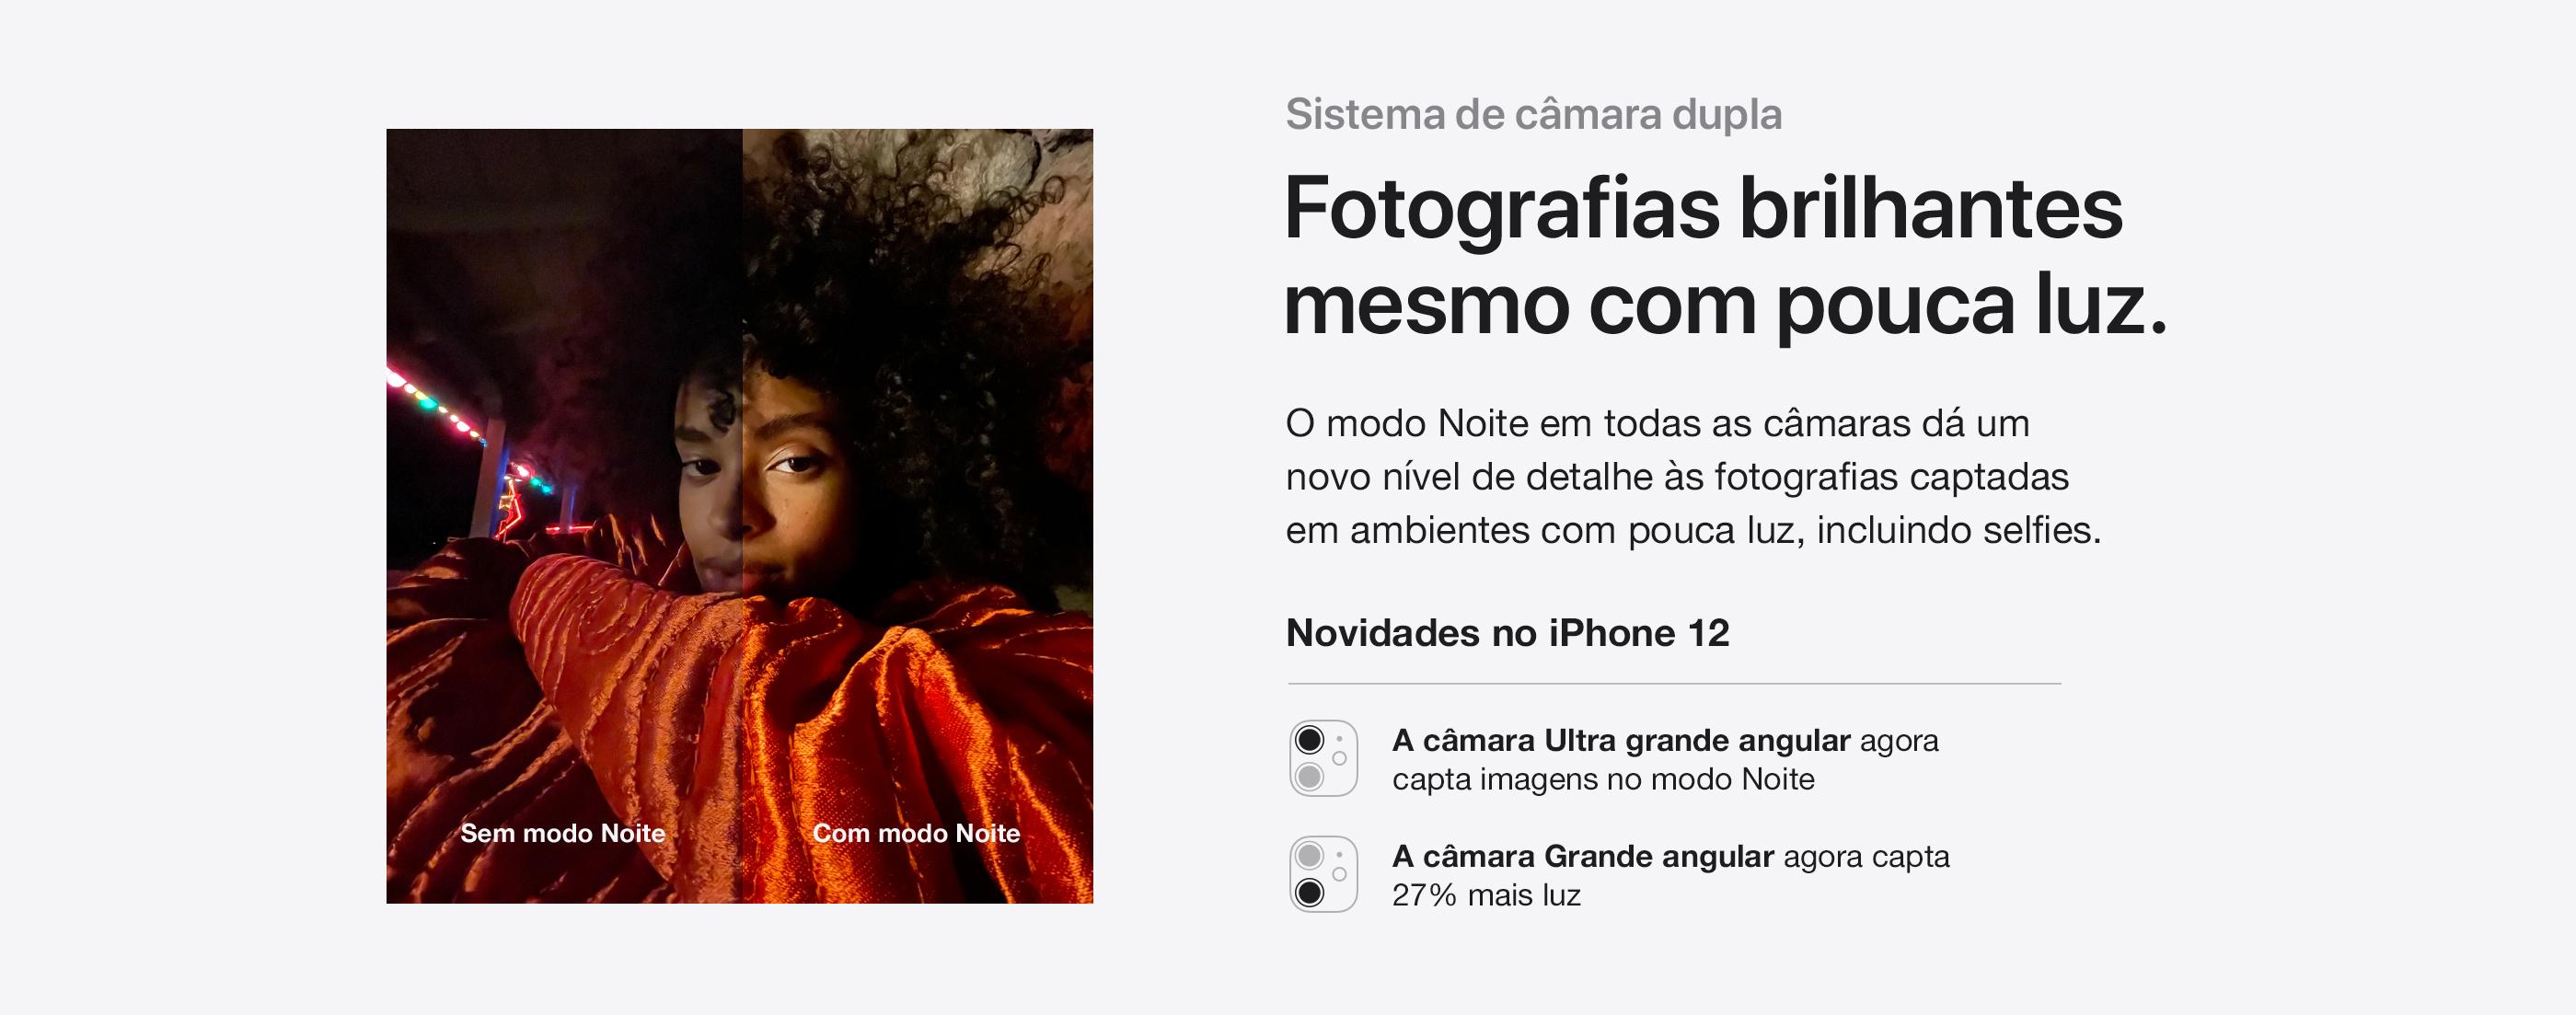 iPhone 12 e iPhone 12 Mini Sistema de câmara dupla